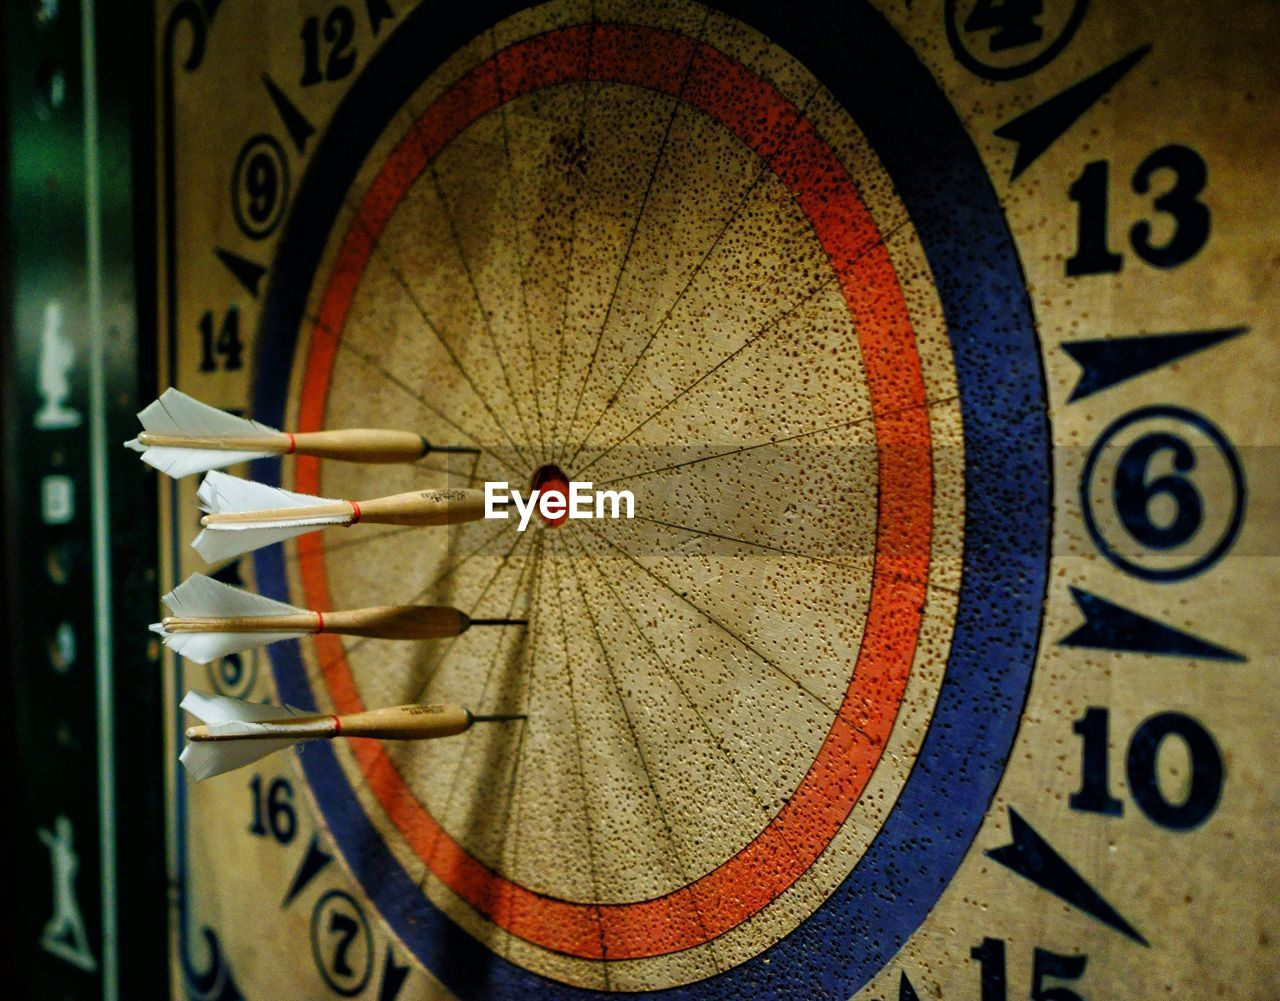 Close-up of dartboards with darts